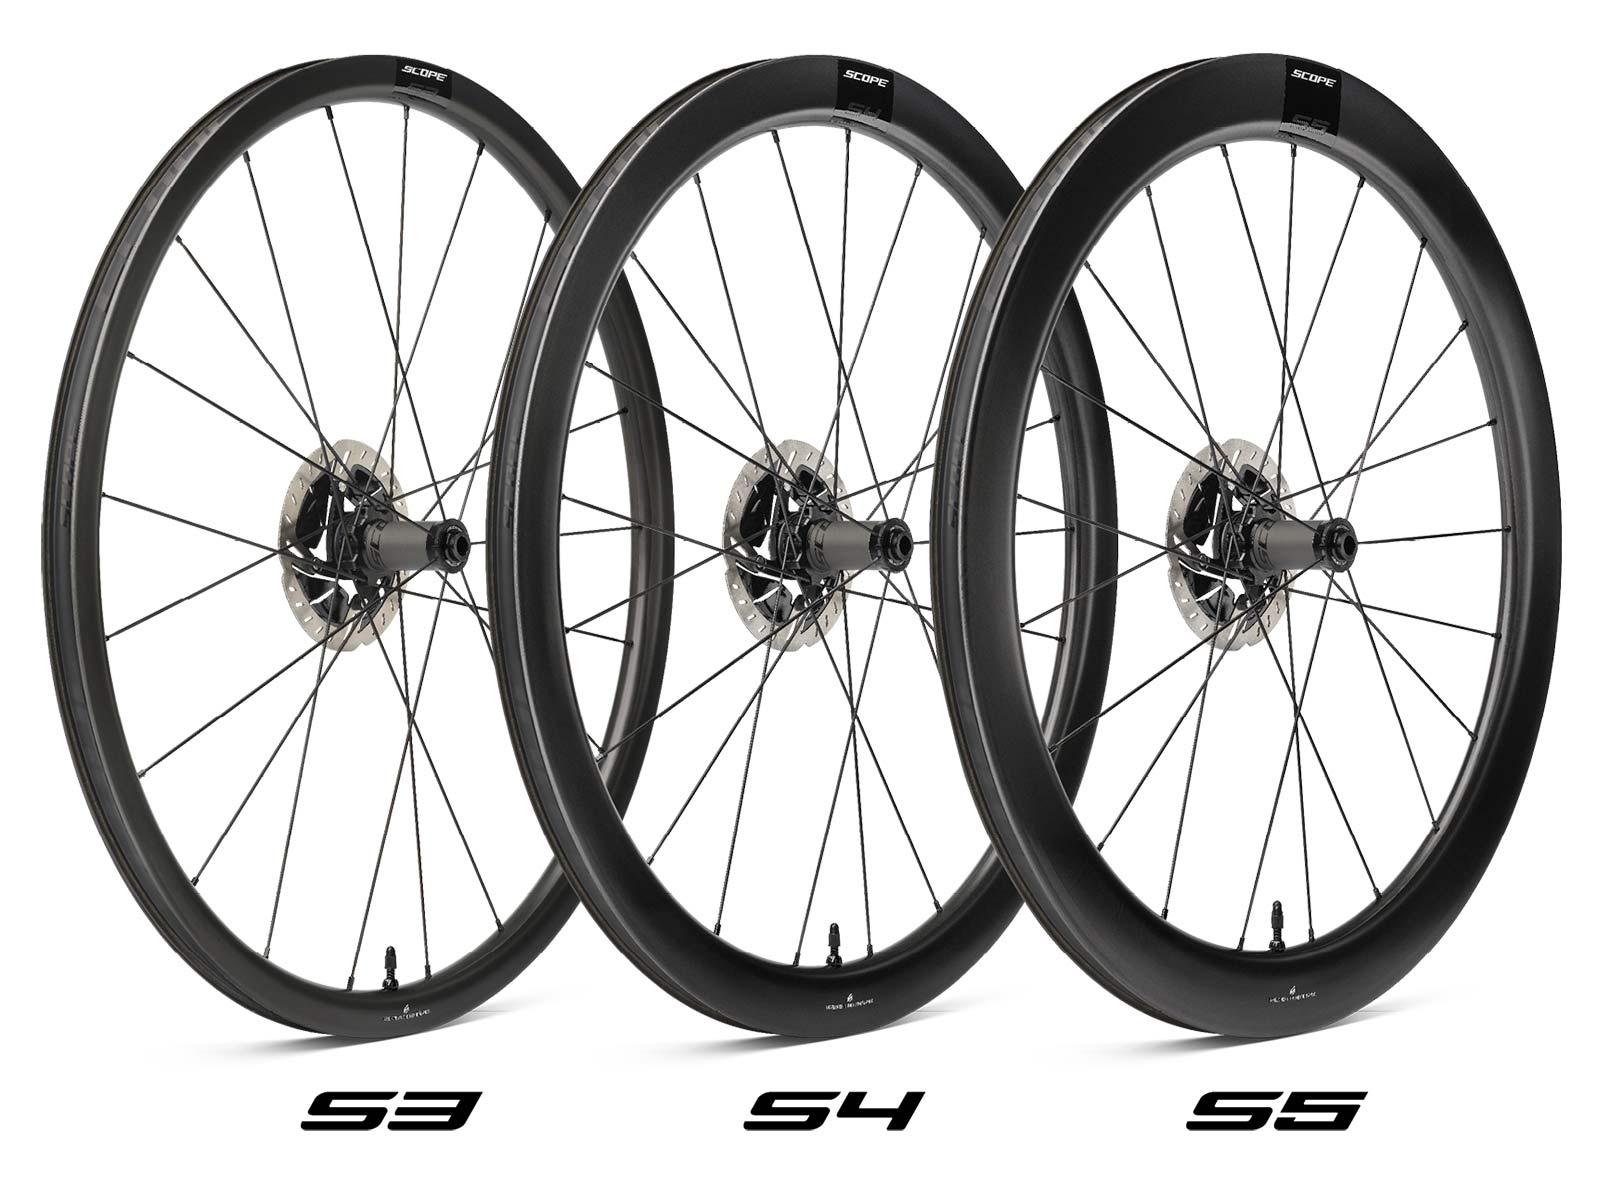 Scope Sport affordable carbon tubeless road wheels, 998€ for rim or disc brakes, 3 depths